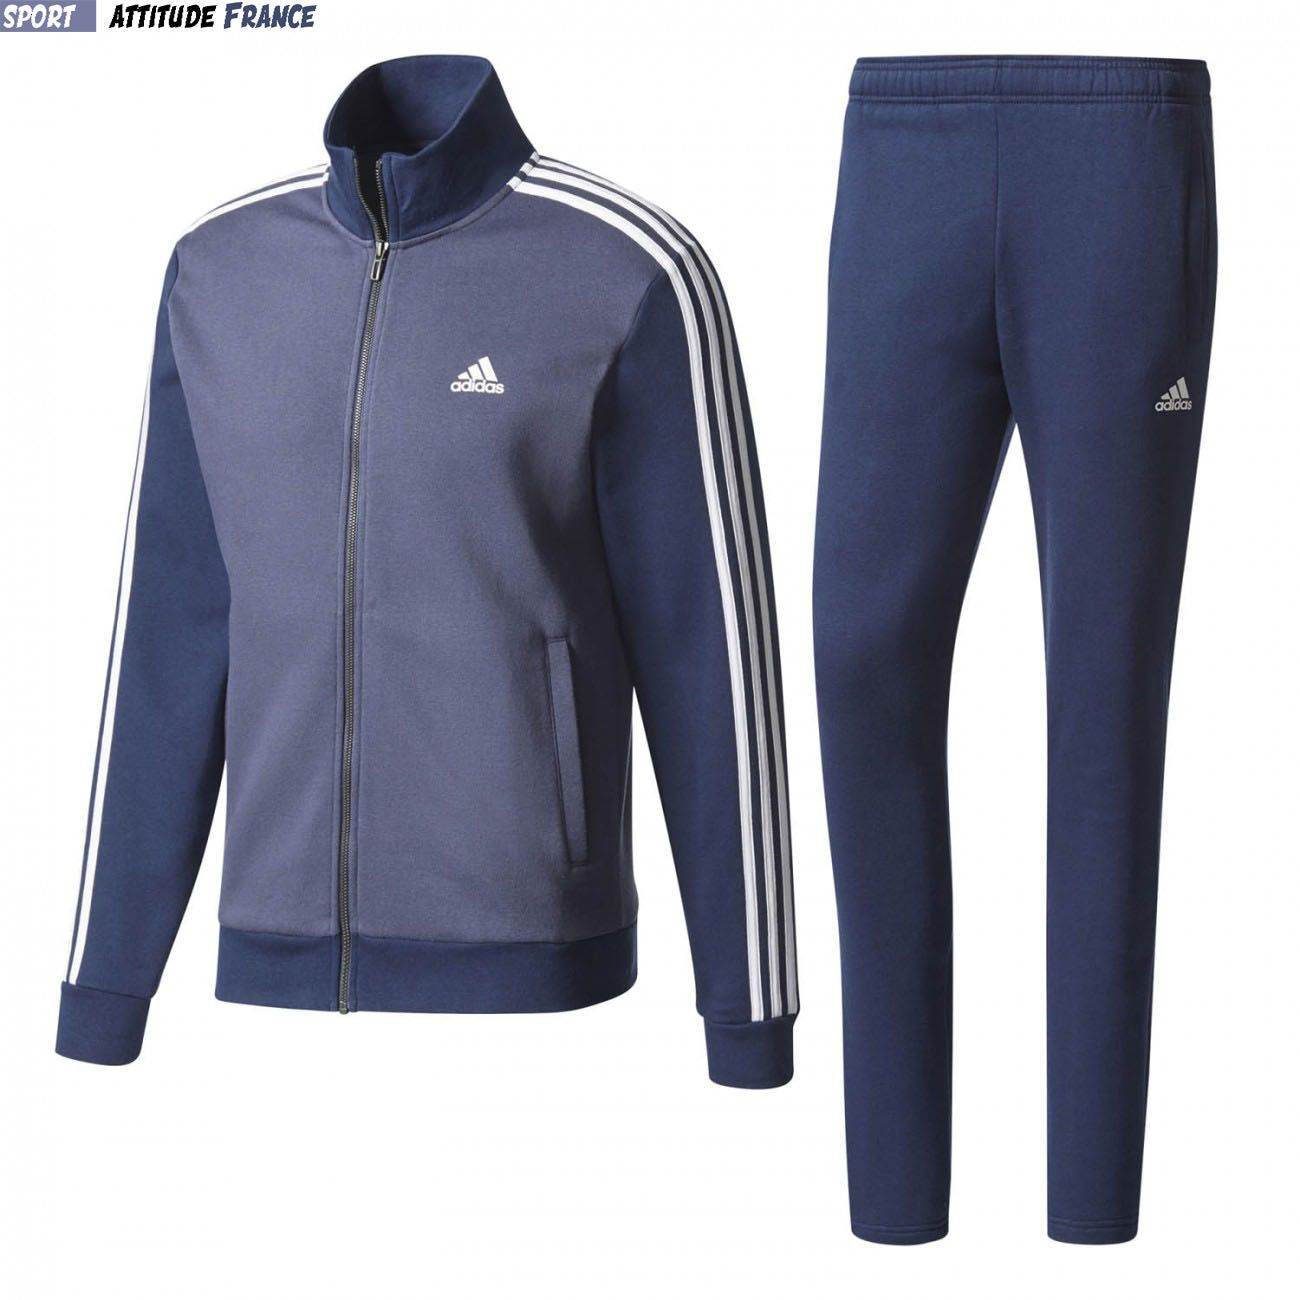 survetement femme Adidas go sport,Adidas navy jogging